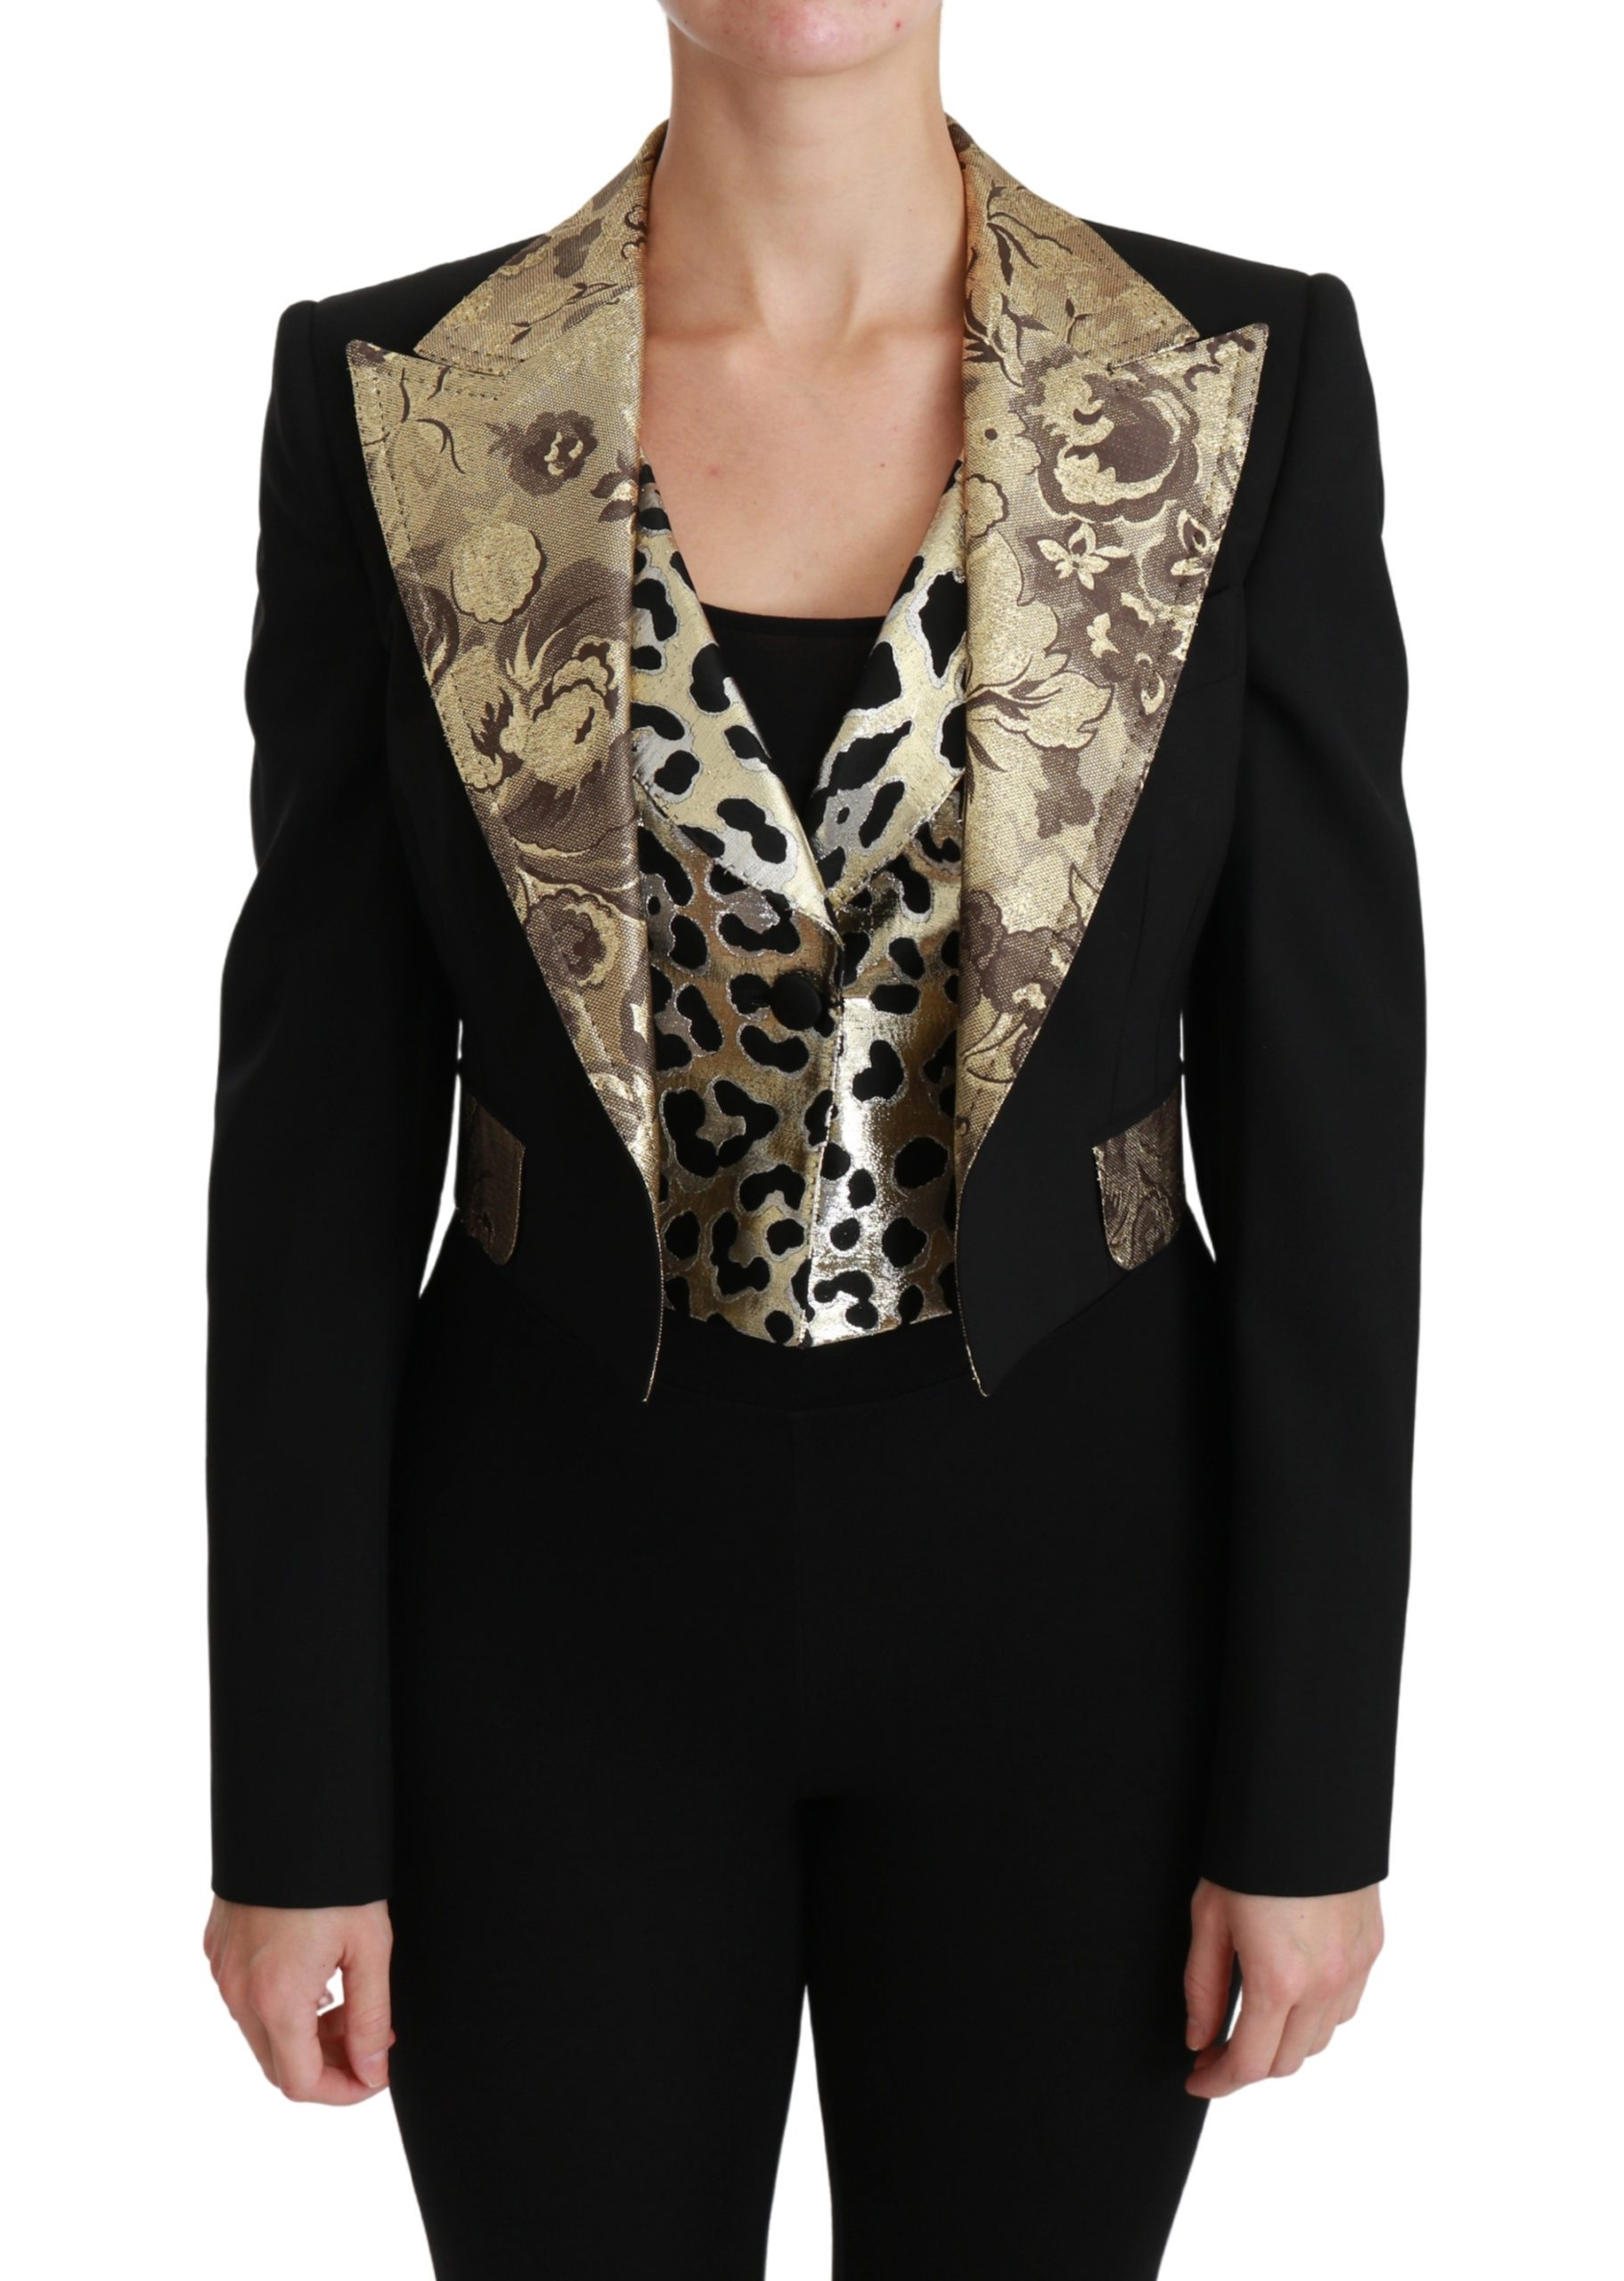 Dolce & Gabbana Women's Jacquard Wool Blazer Black JKT2561 - IT40|S